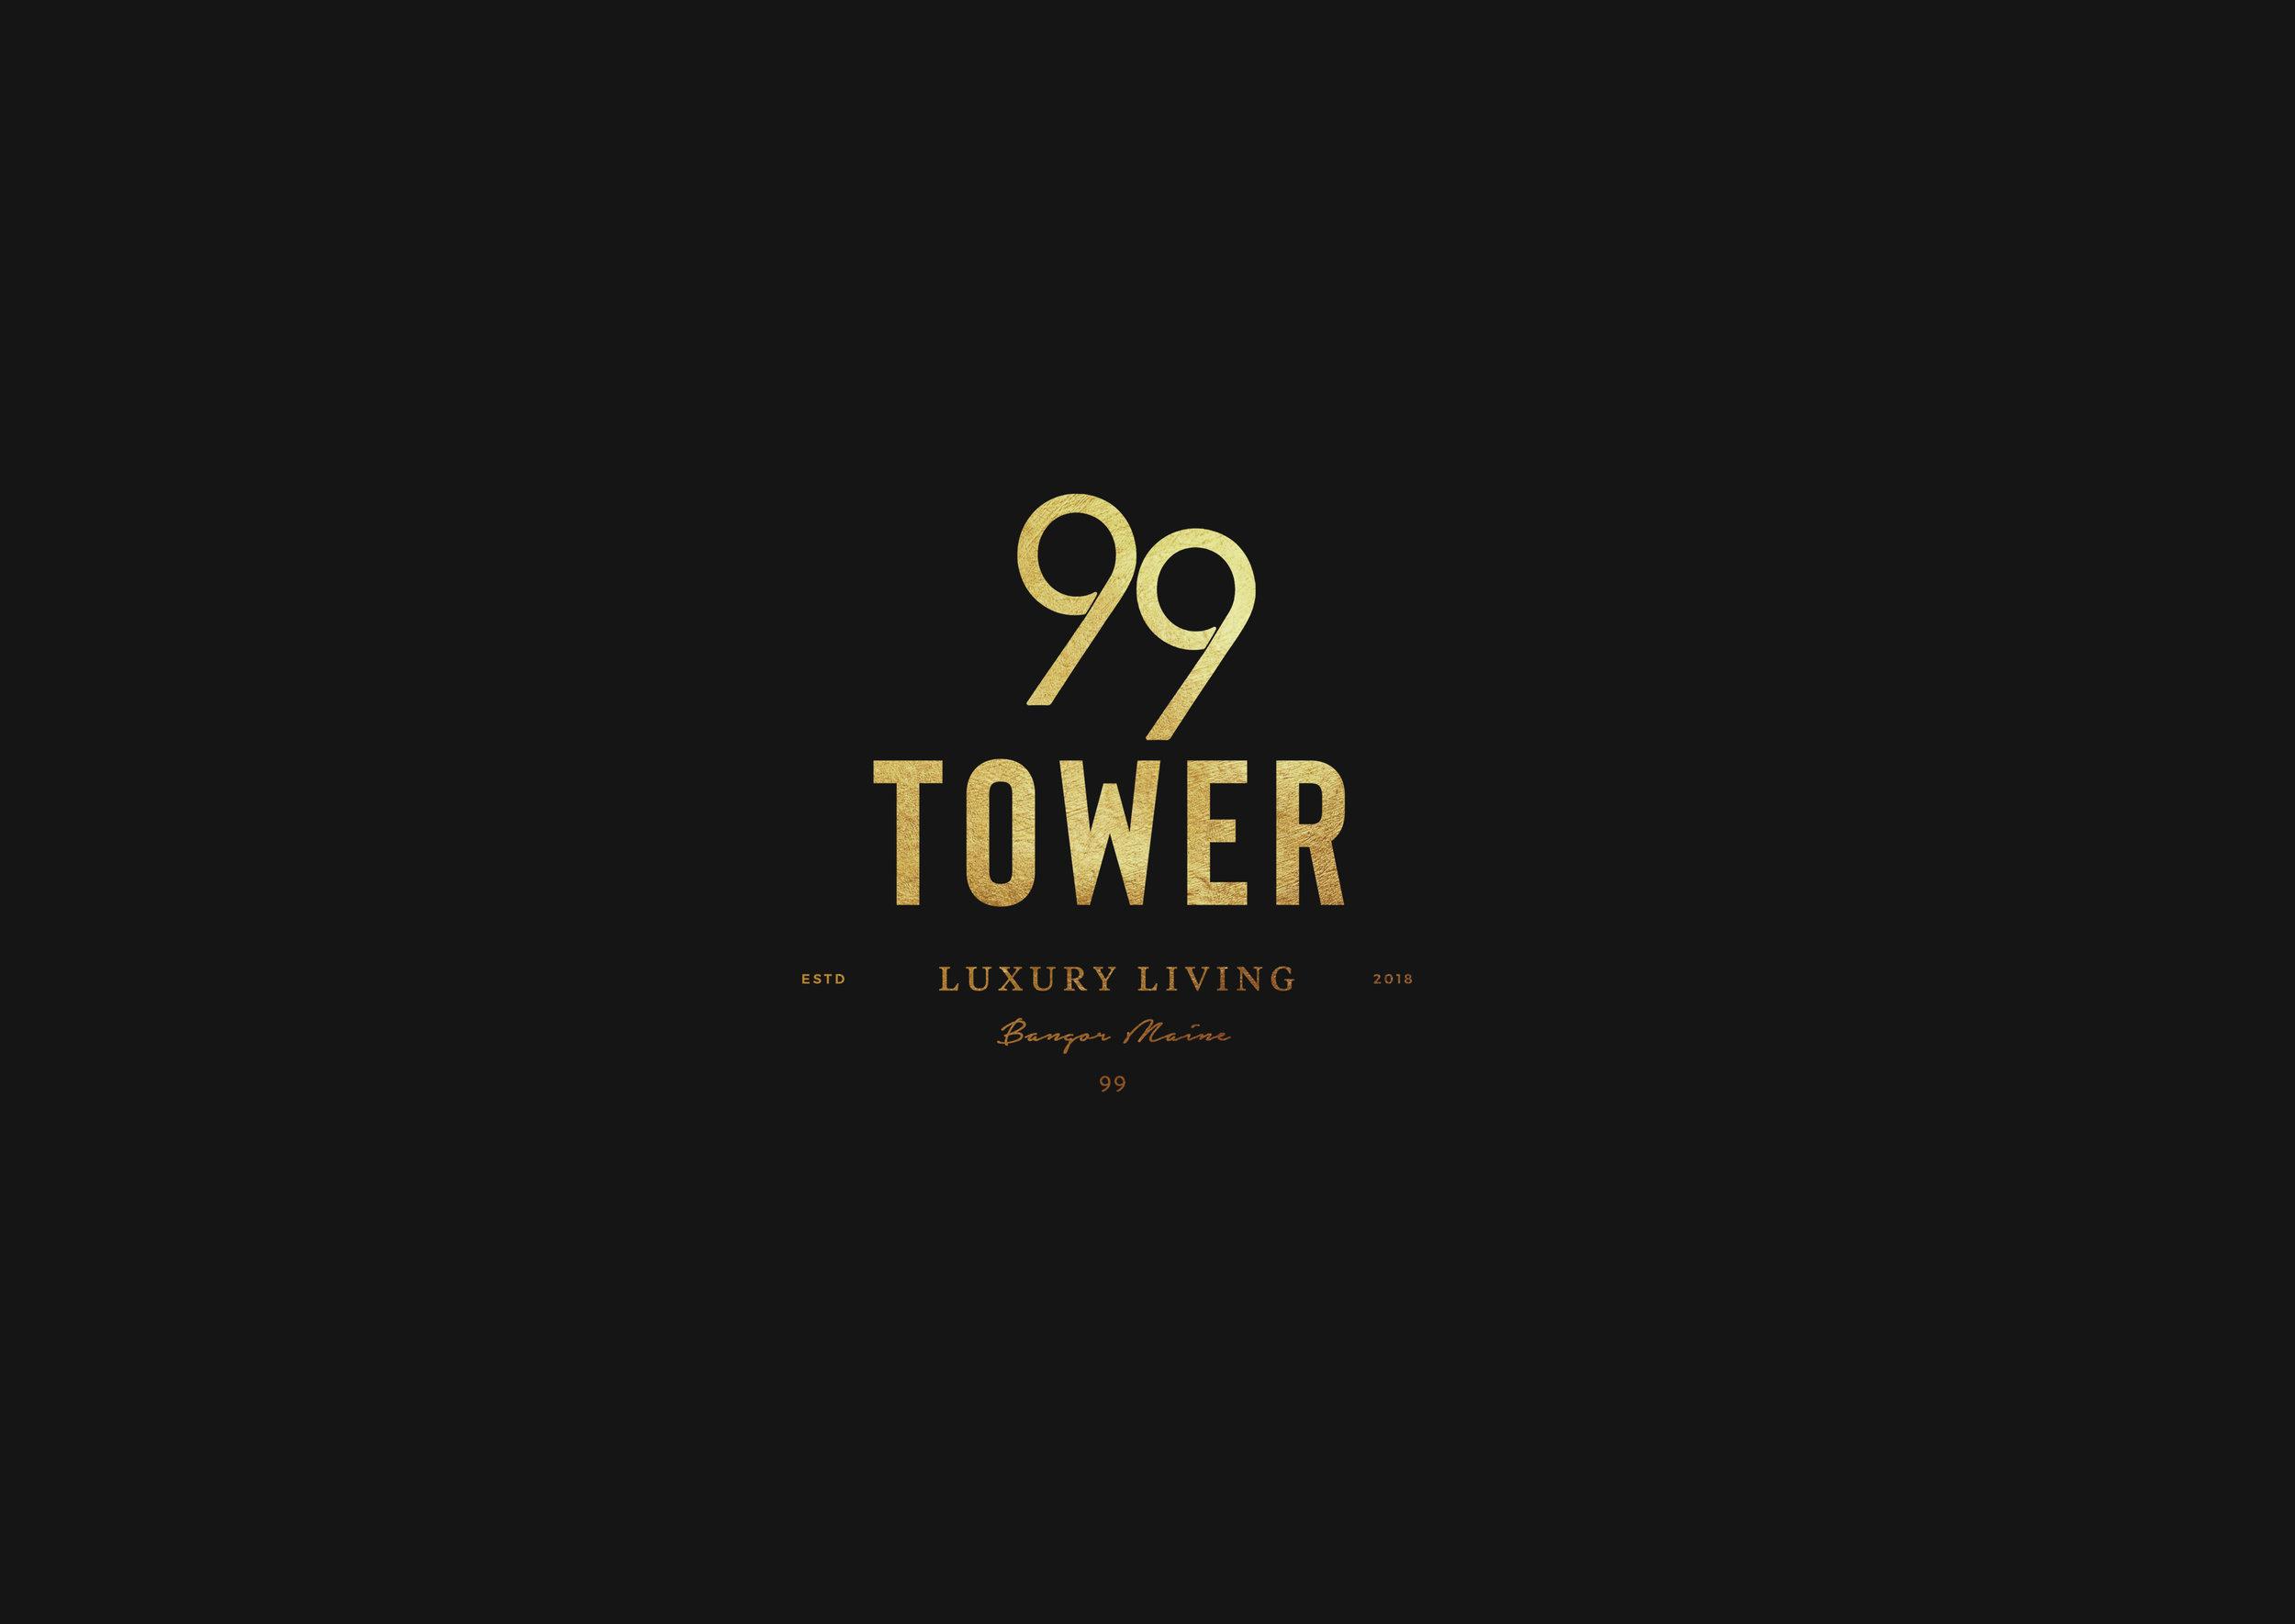 Tower 99.jpg